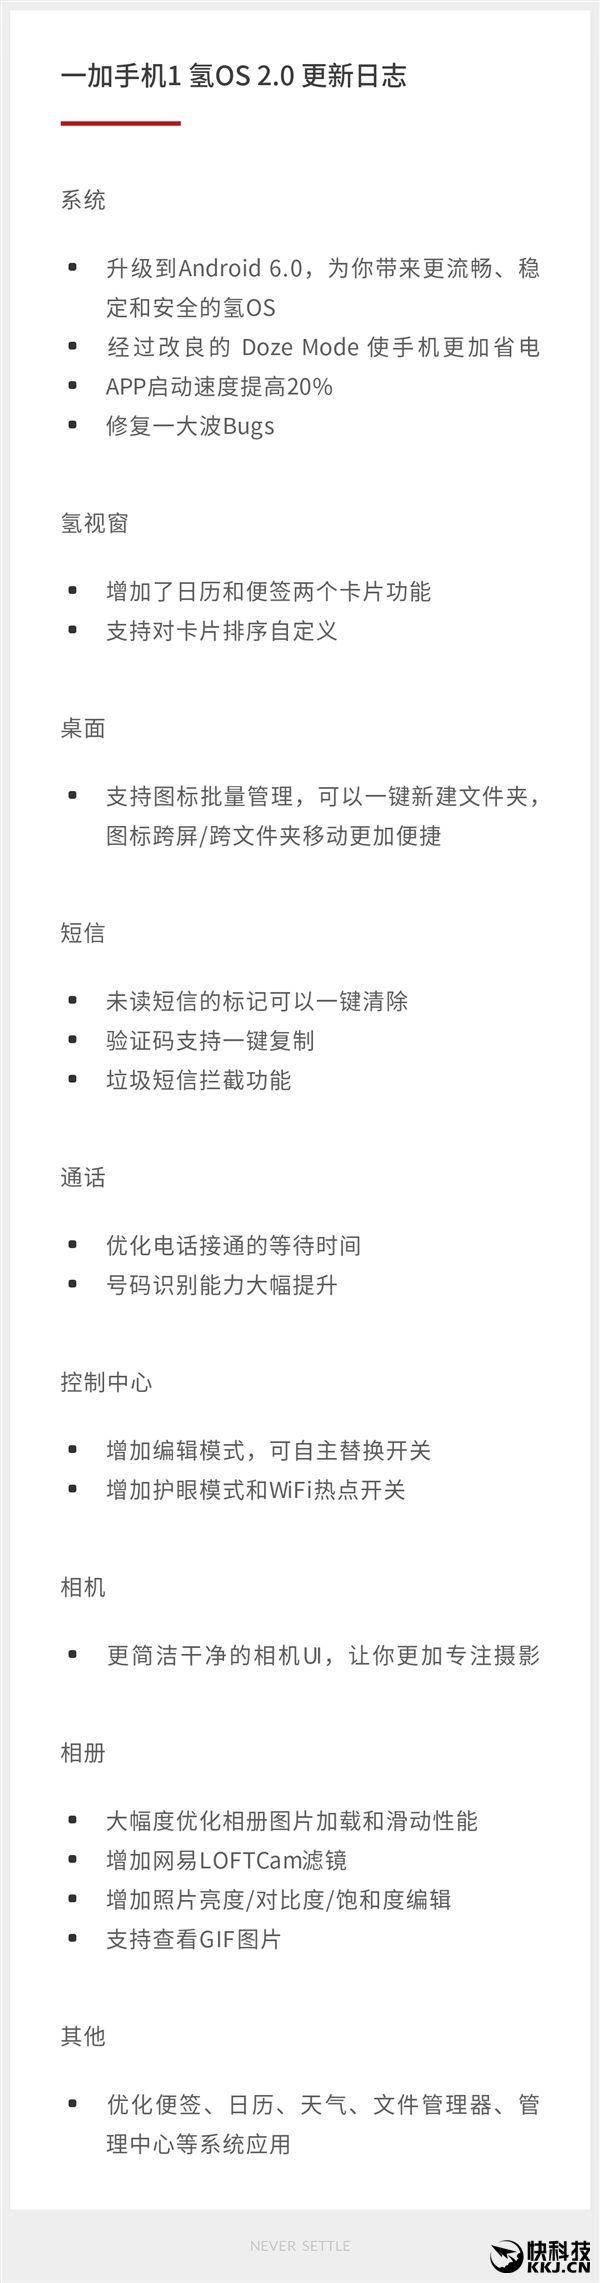 OnePlus One и OnePlus X официально обновились до Android 6.0 Marshmallow – фото 2